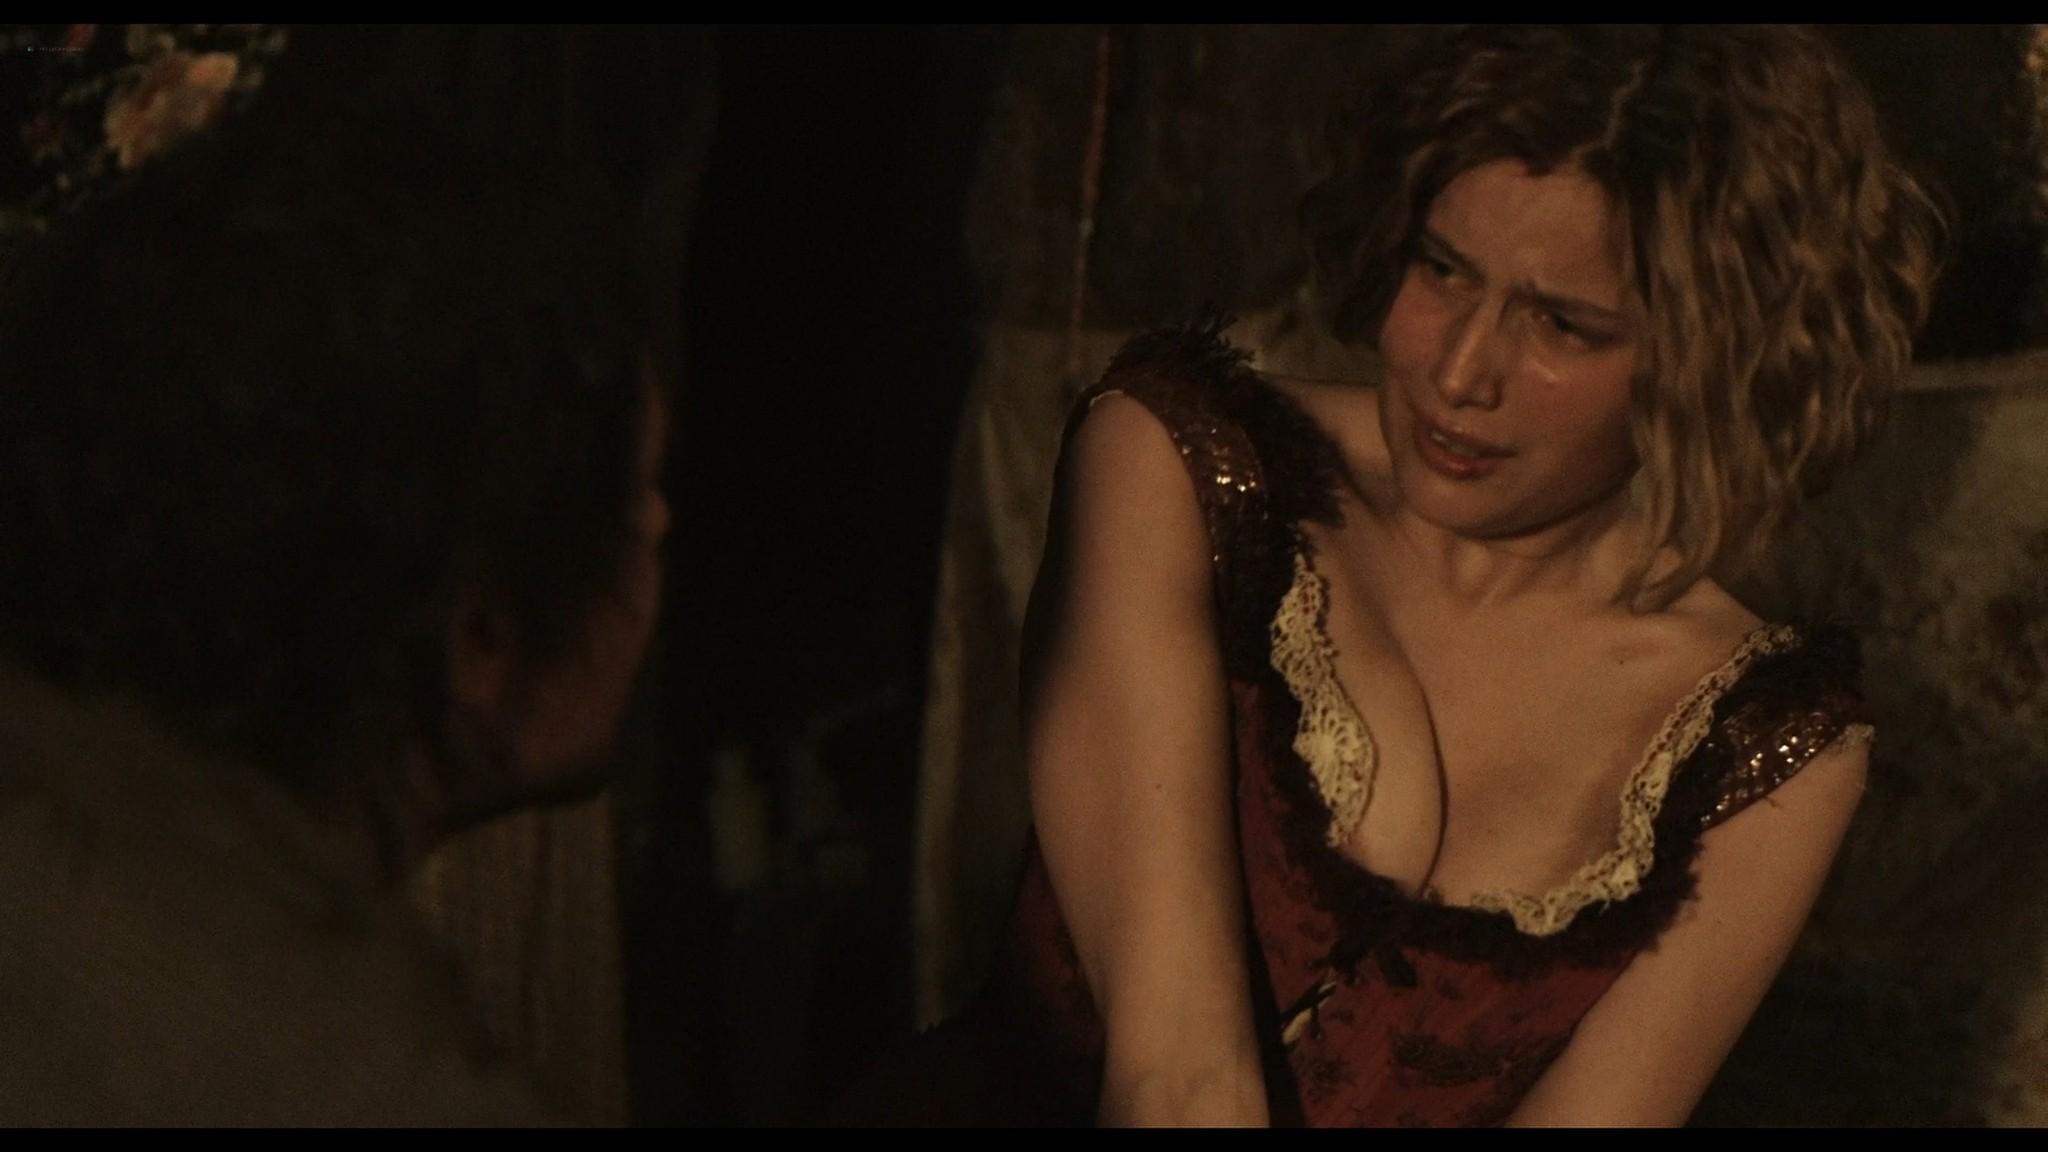 Laetitia Casta nude topless and very hot La jeune fille et les loups 2007 HD 1080p BluRay 7